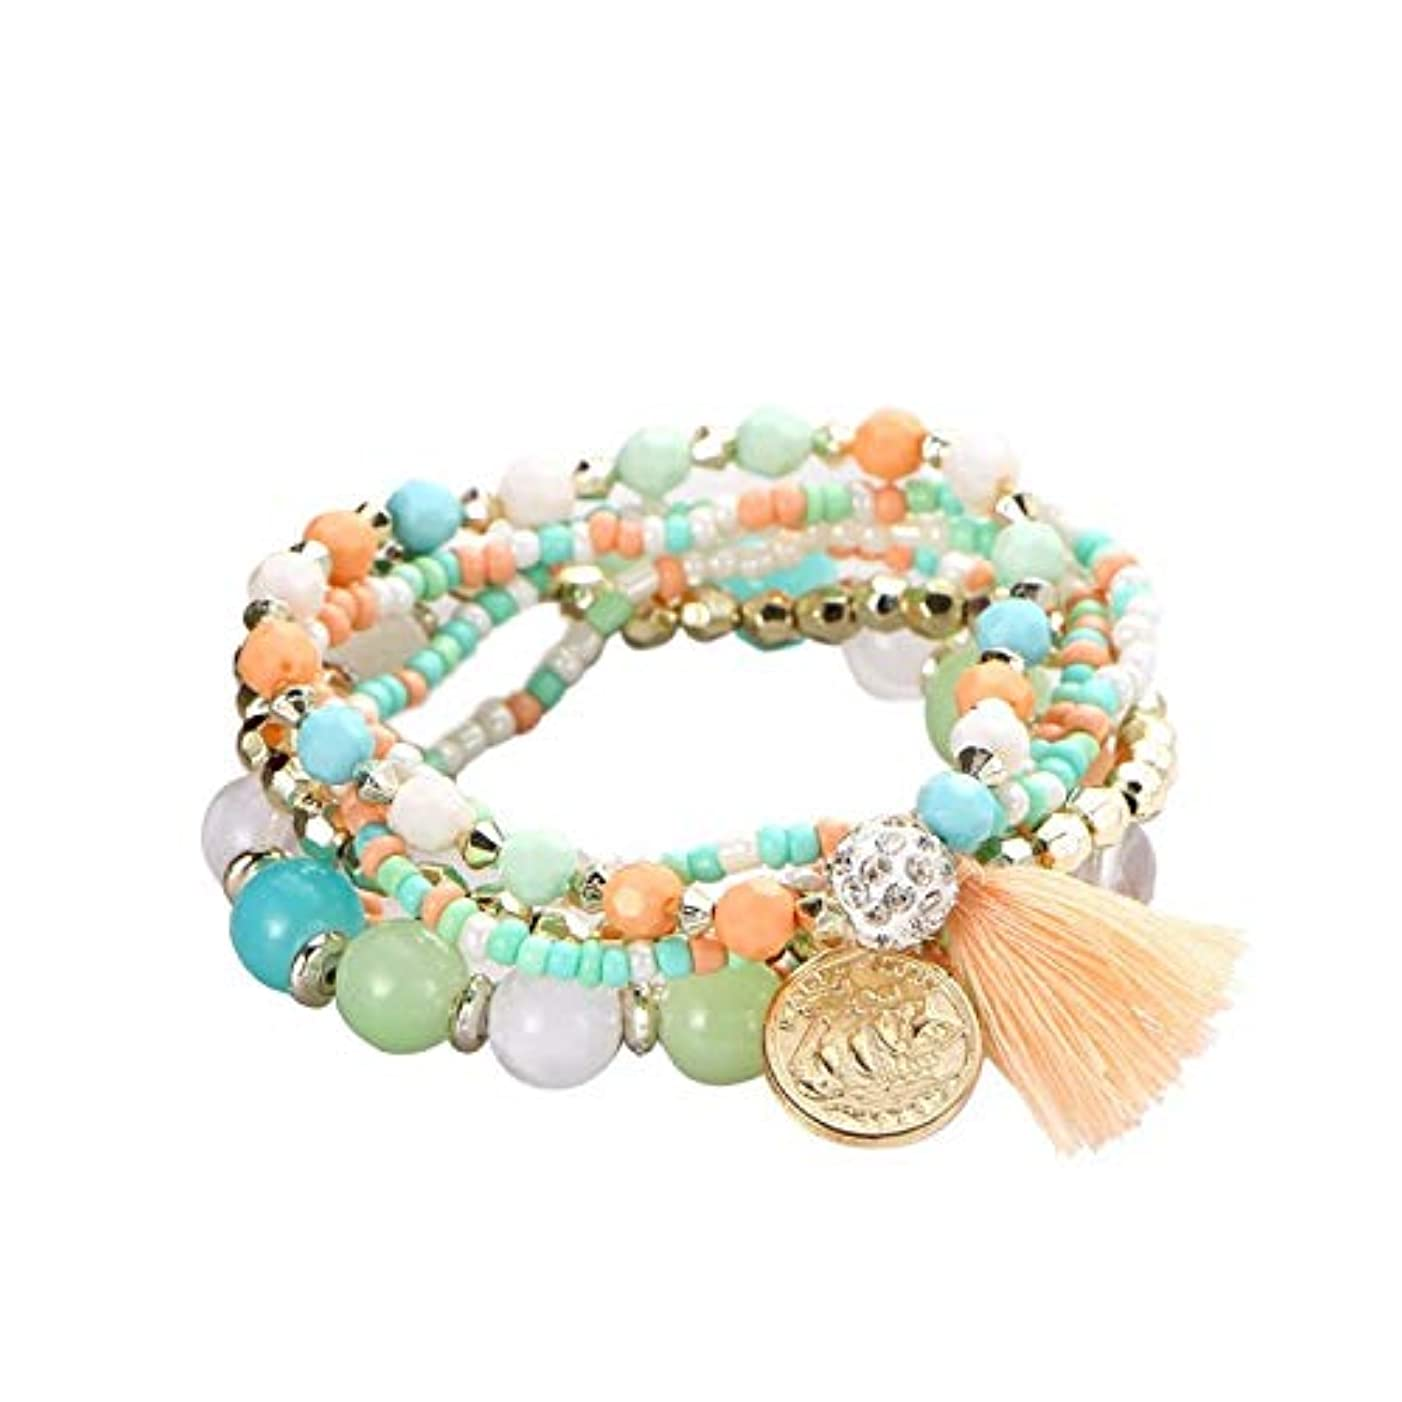 Qian Qian Fashion Bohemian Crystal Multicolor Beads Fringed Woven Coin Bracelet Adjustable Elastic Man Woman